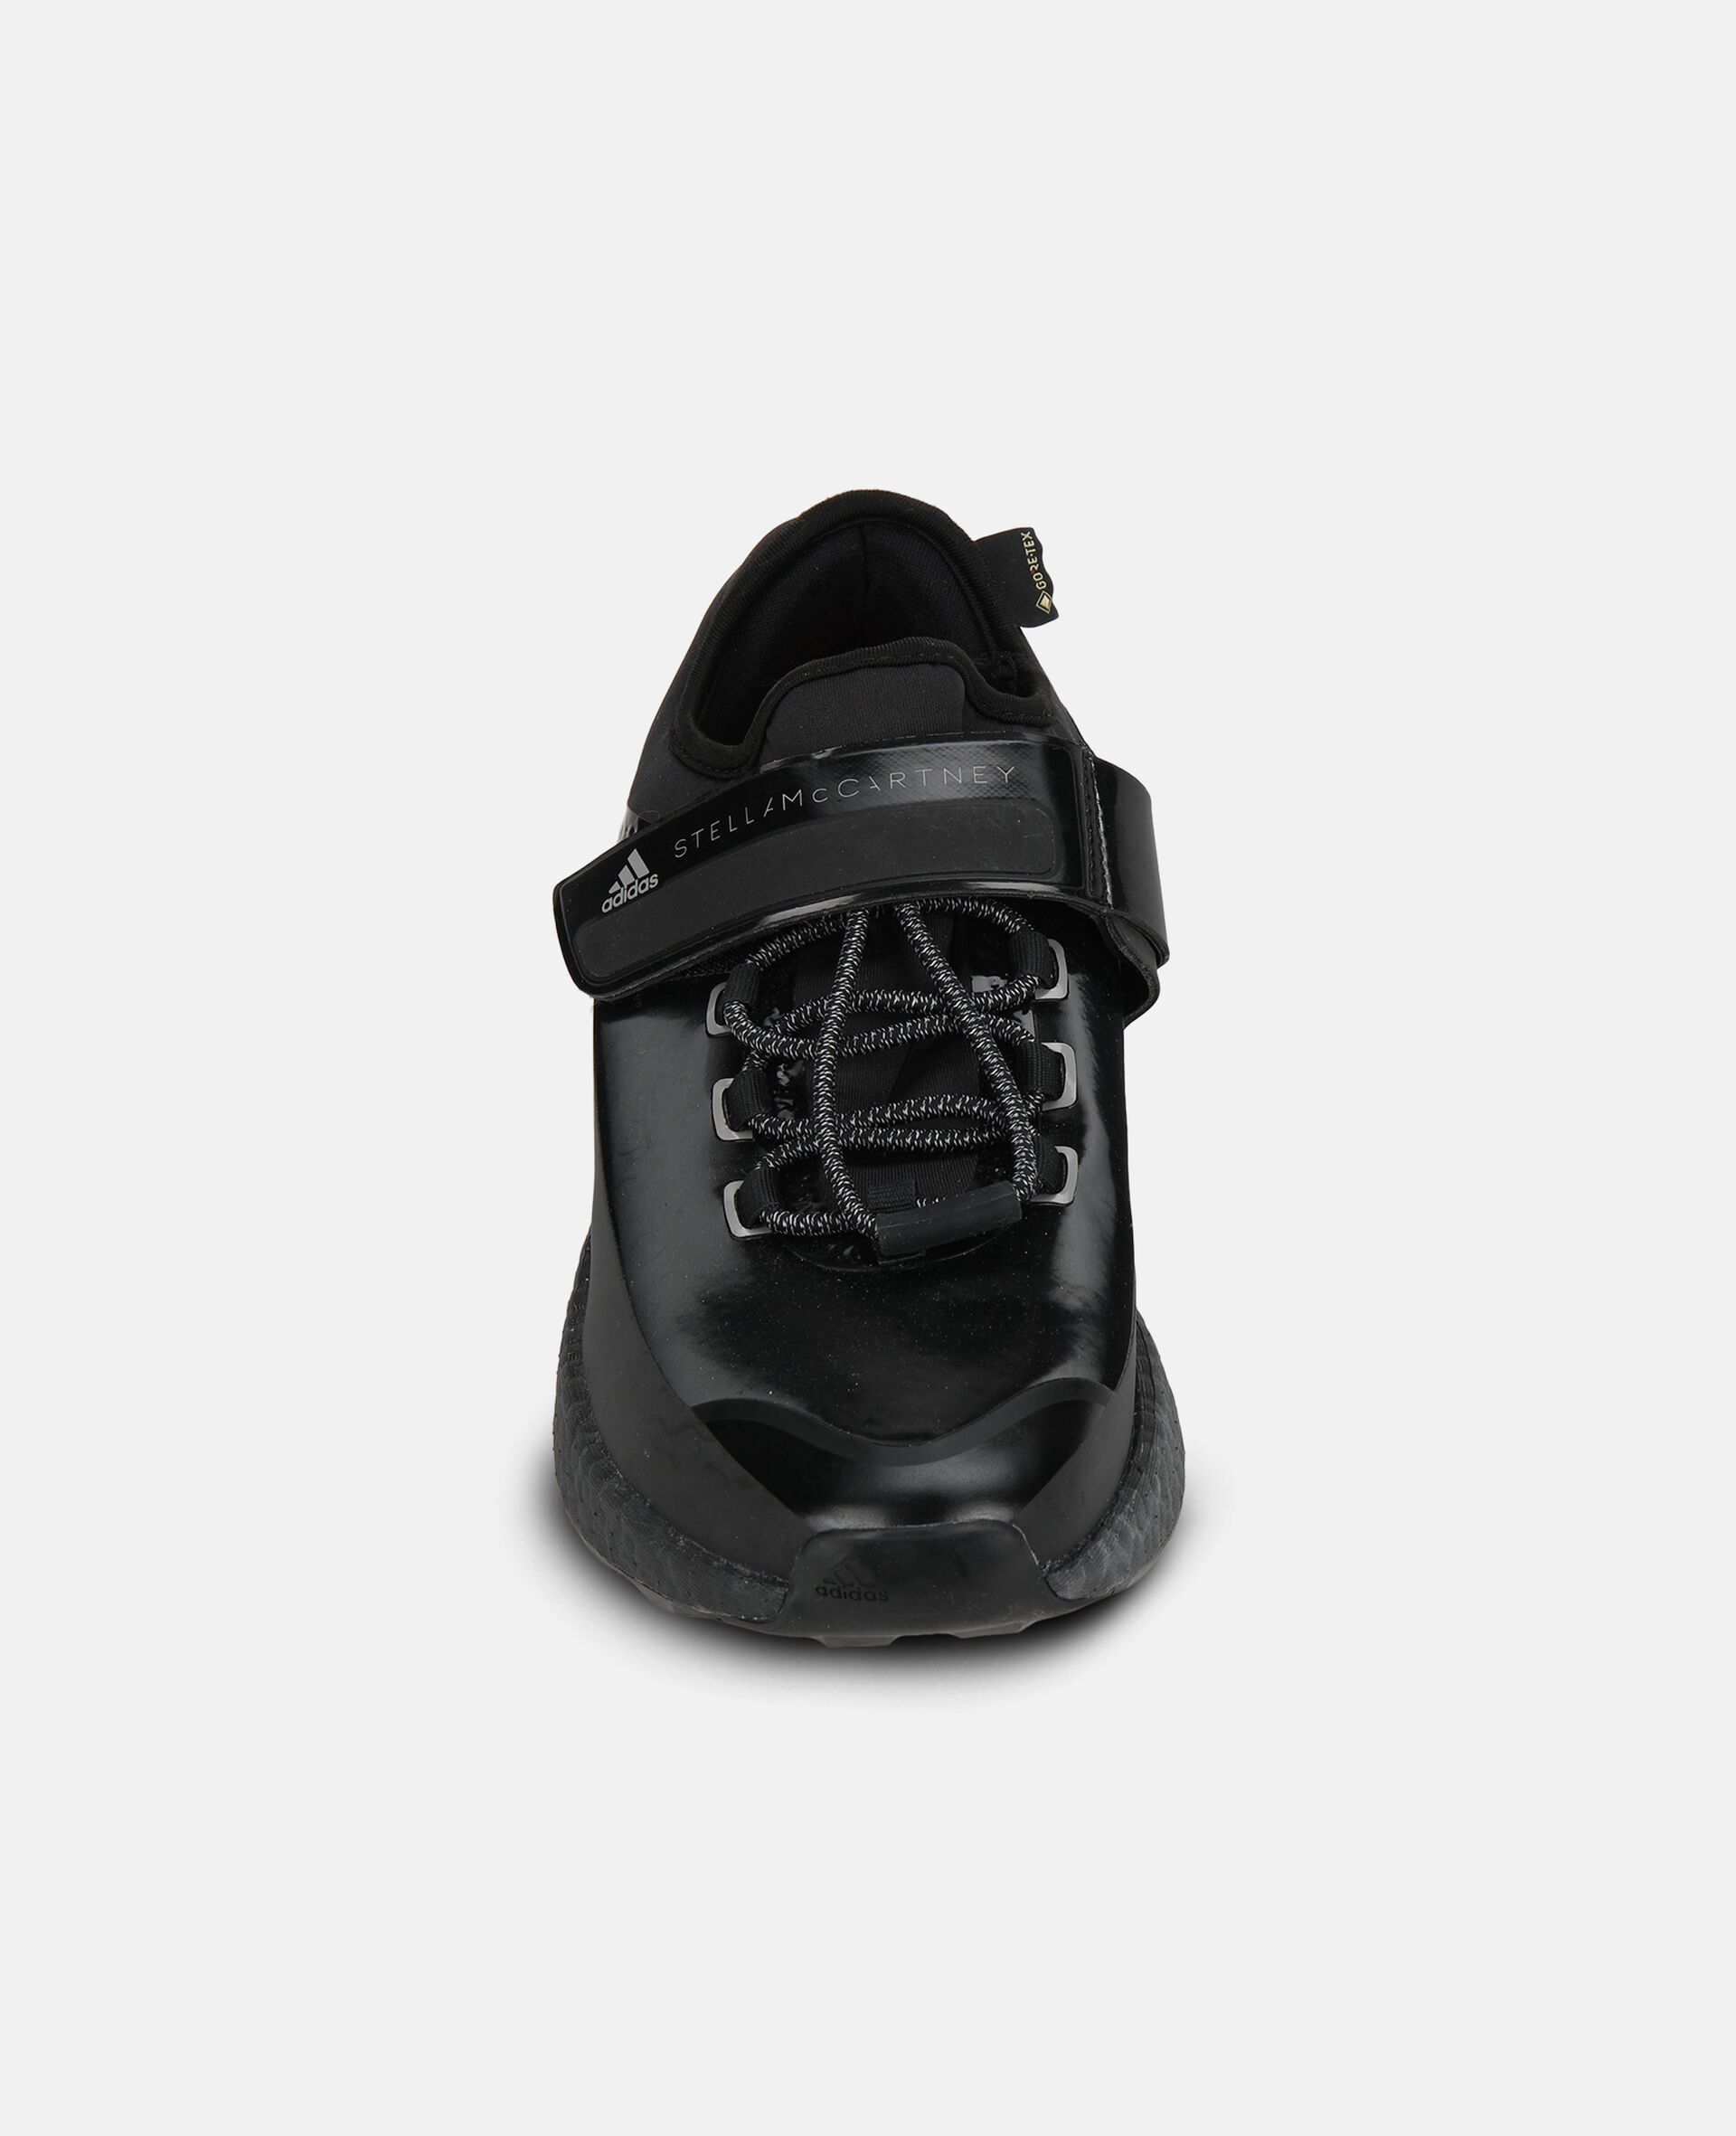 Chaussures de running Outdoor Boost rain.rdy noires -Noir-large image number 2